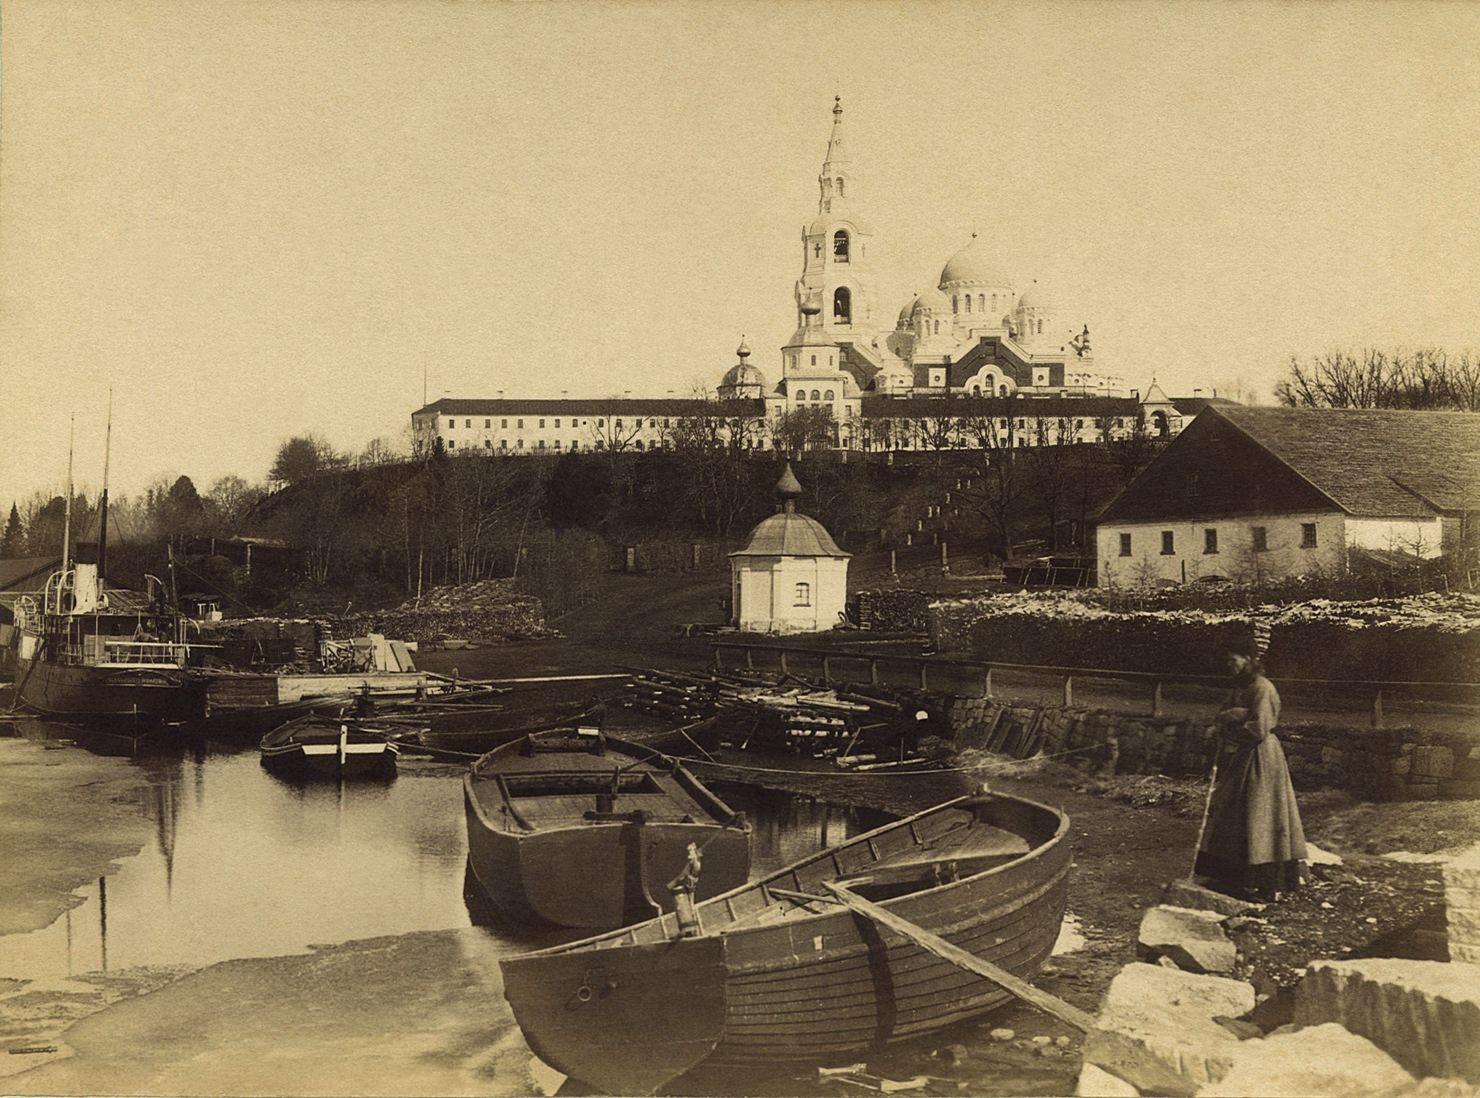 Общий вид Валаамской обители, 1890-е годы. Из коллекции Константина Бенедиктова